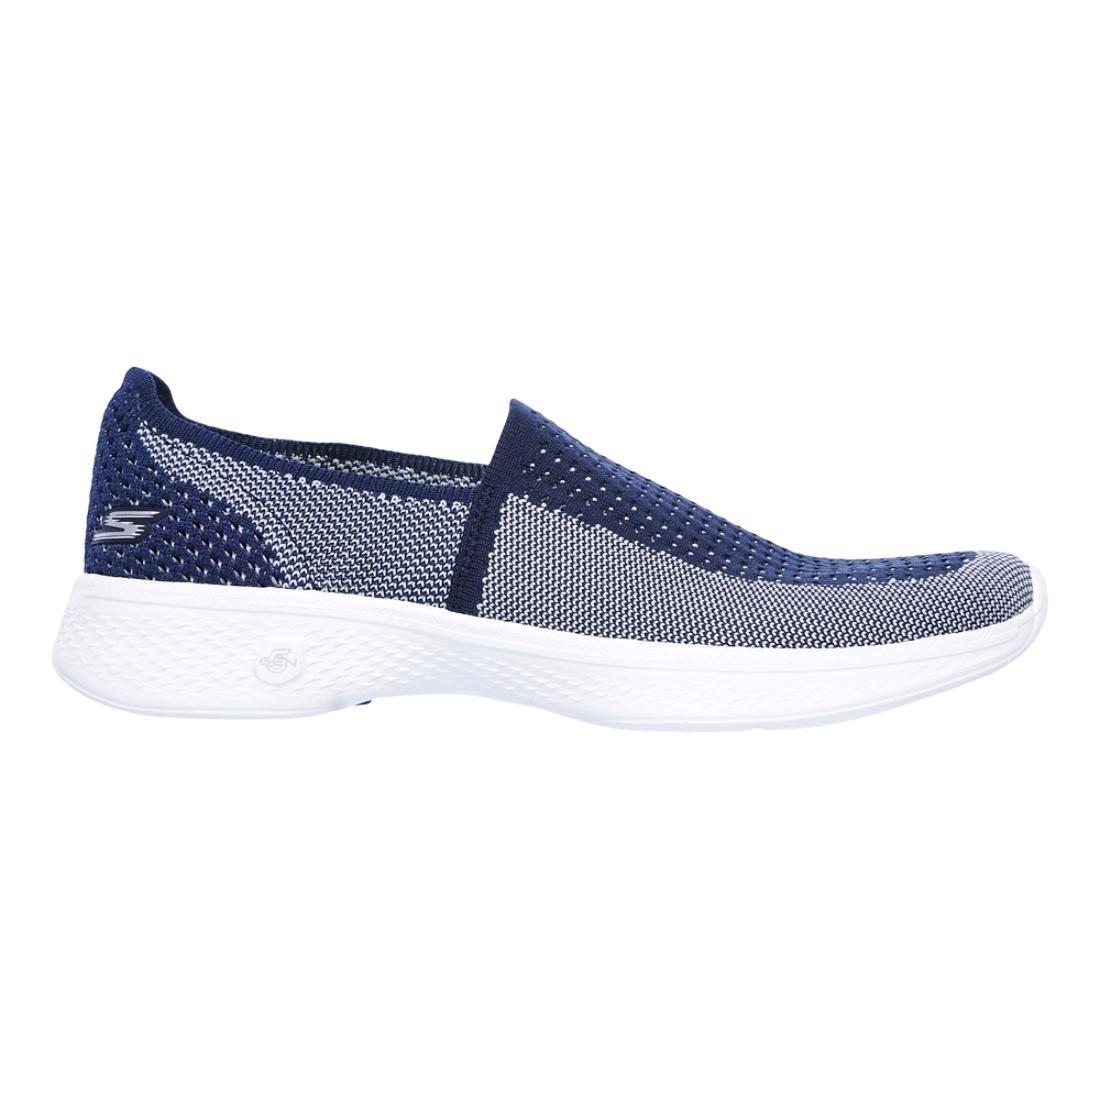 Skechers Womens/Ladies Go Walk 4 Ravish Lightweight Breathable Shoes 41 EU|Azul Marino/Blanco